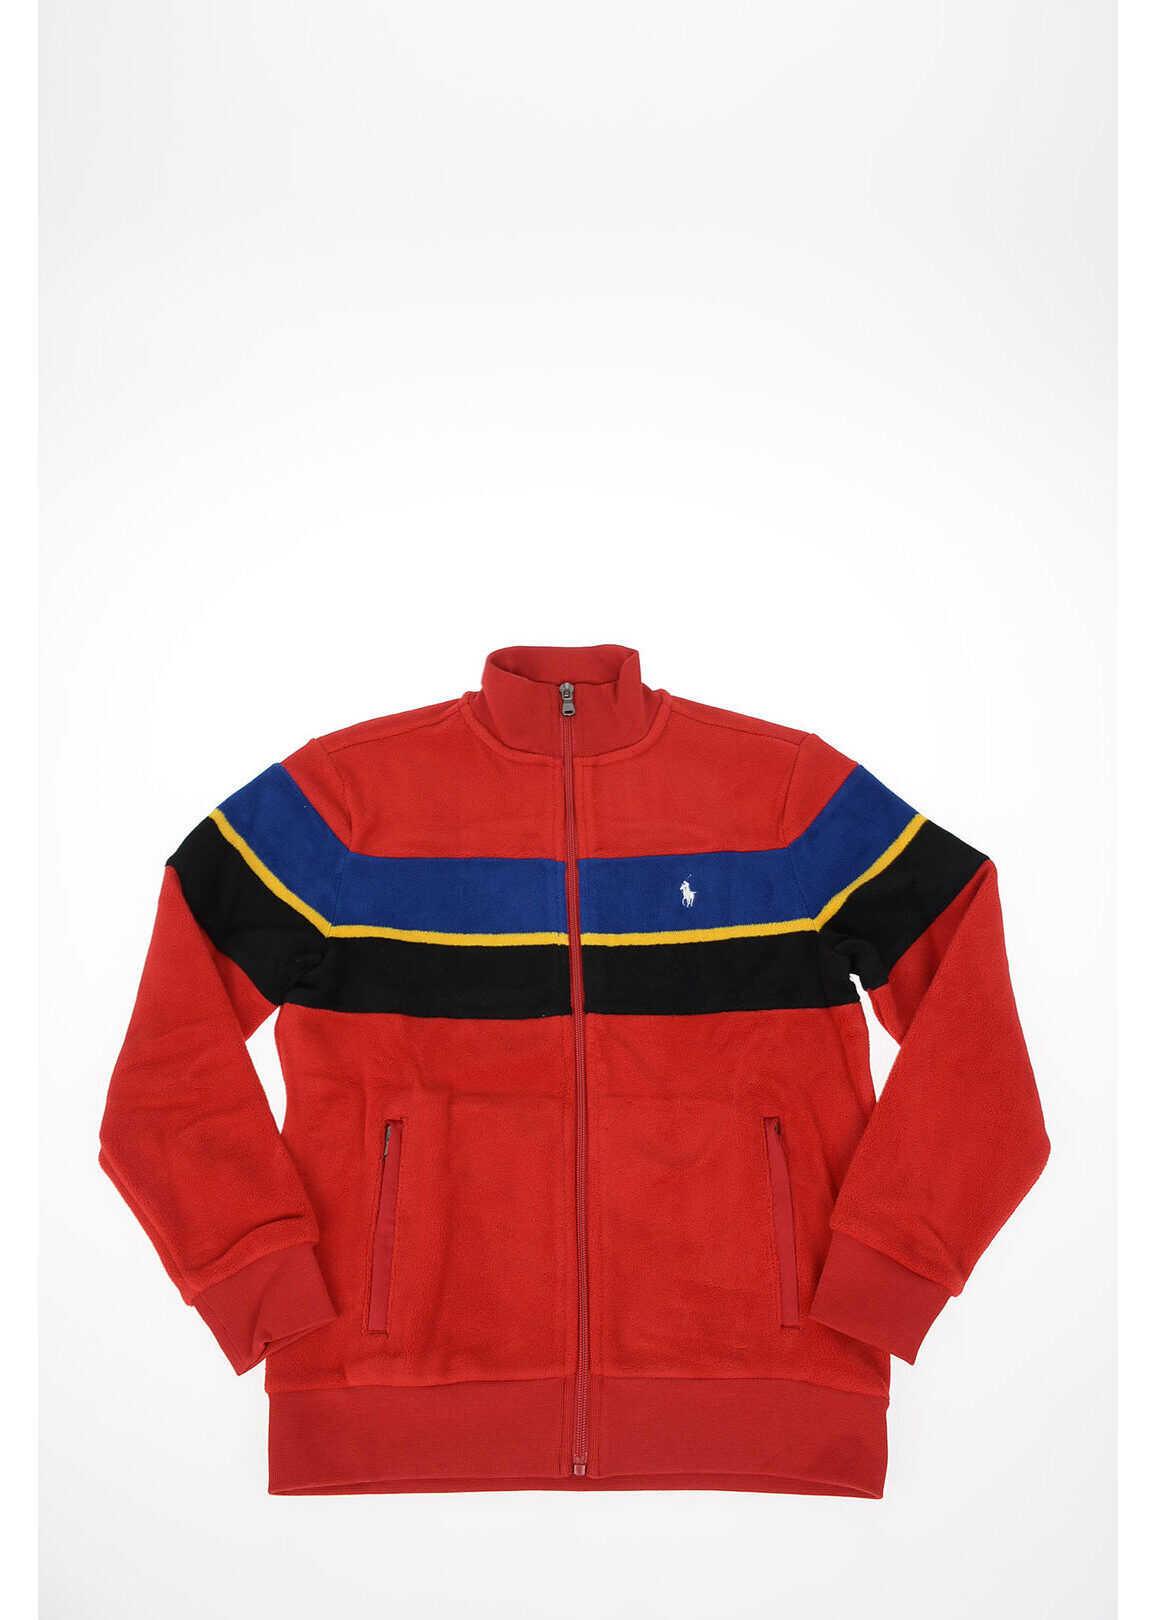 Polo Ralph Lauren Kids Pile Full zip HOLIDAY I Sweatshirt RED